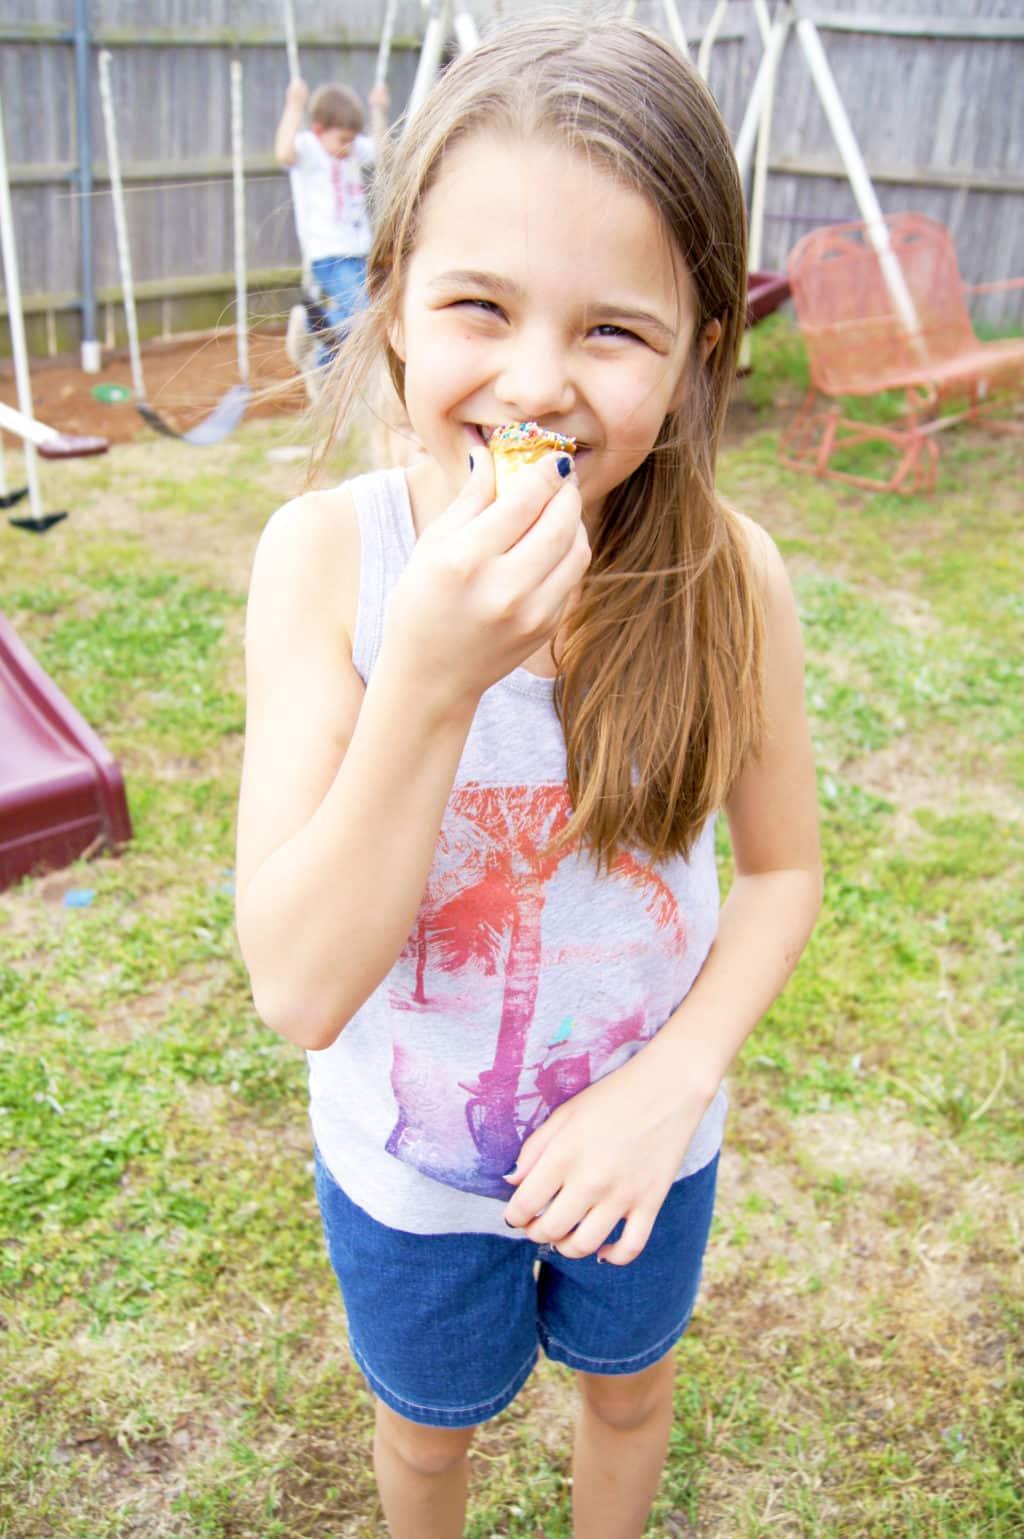 5 Easy After School Snack Ideas